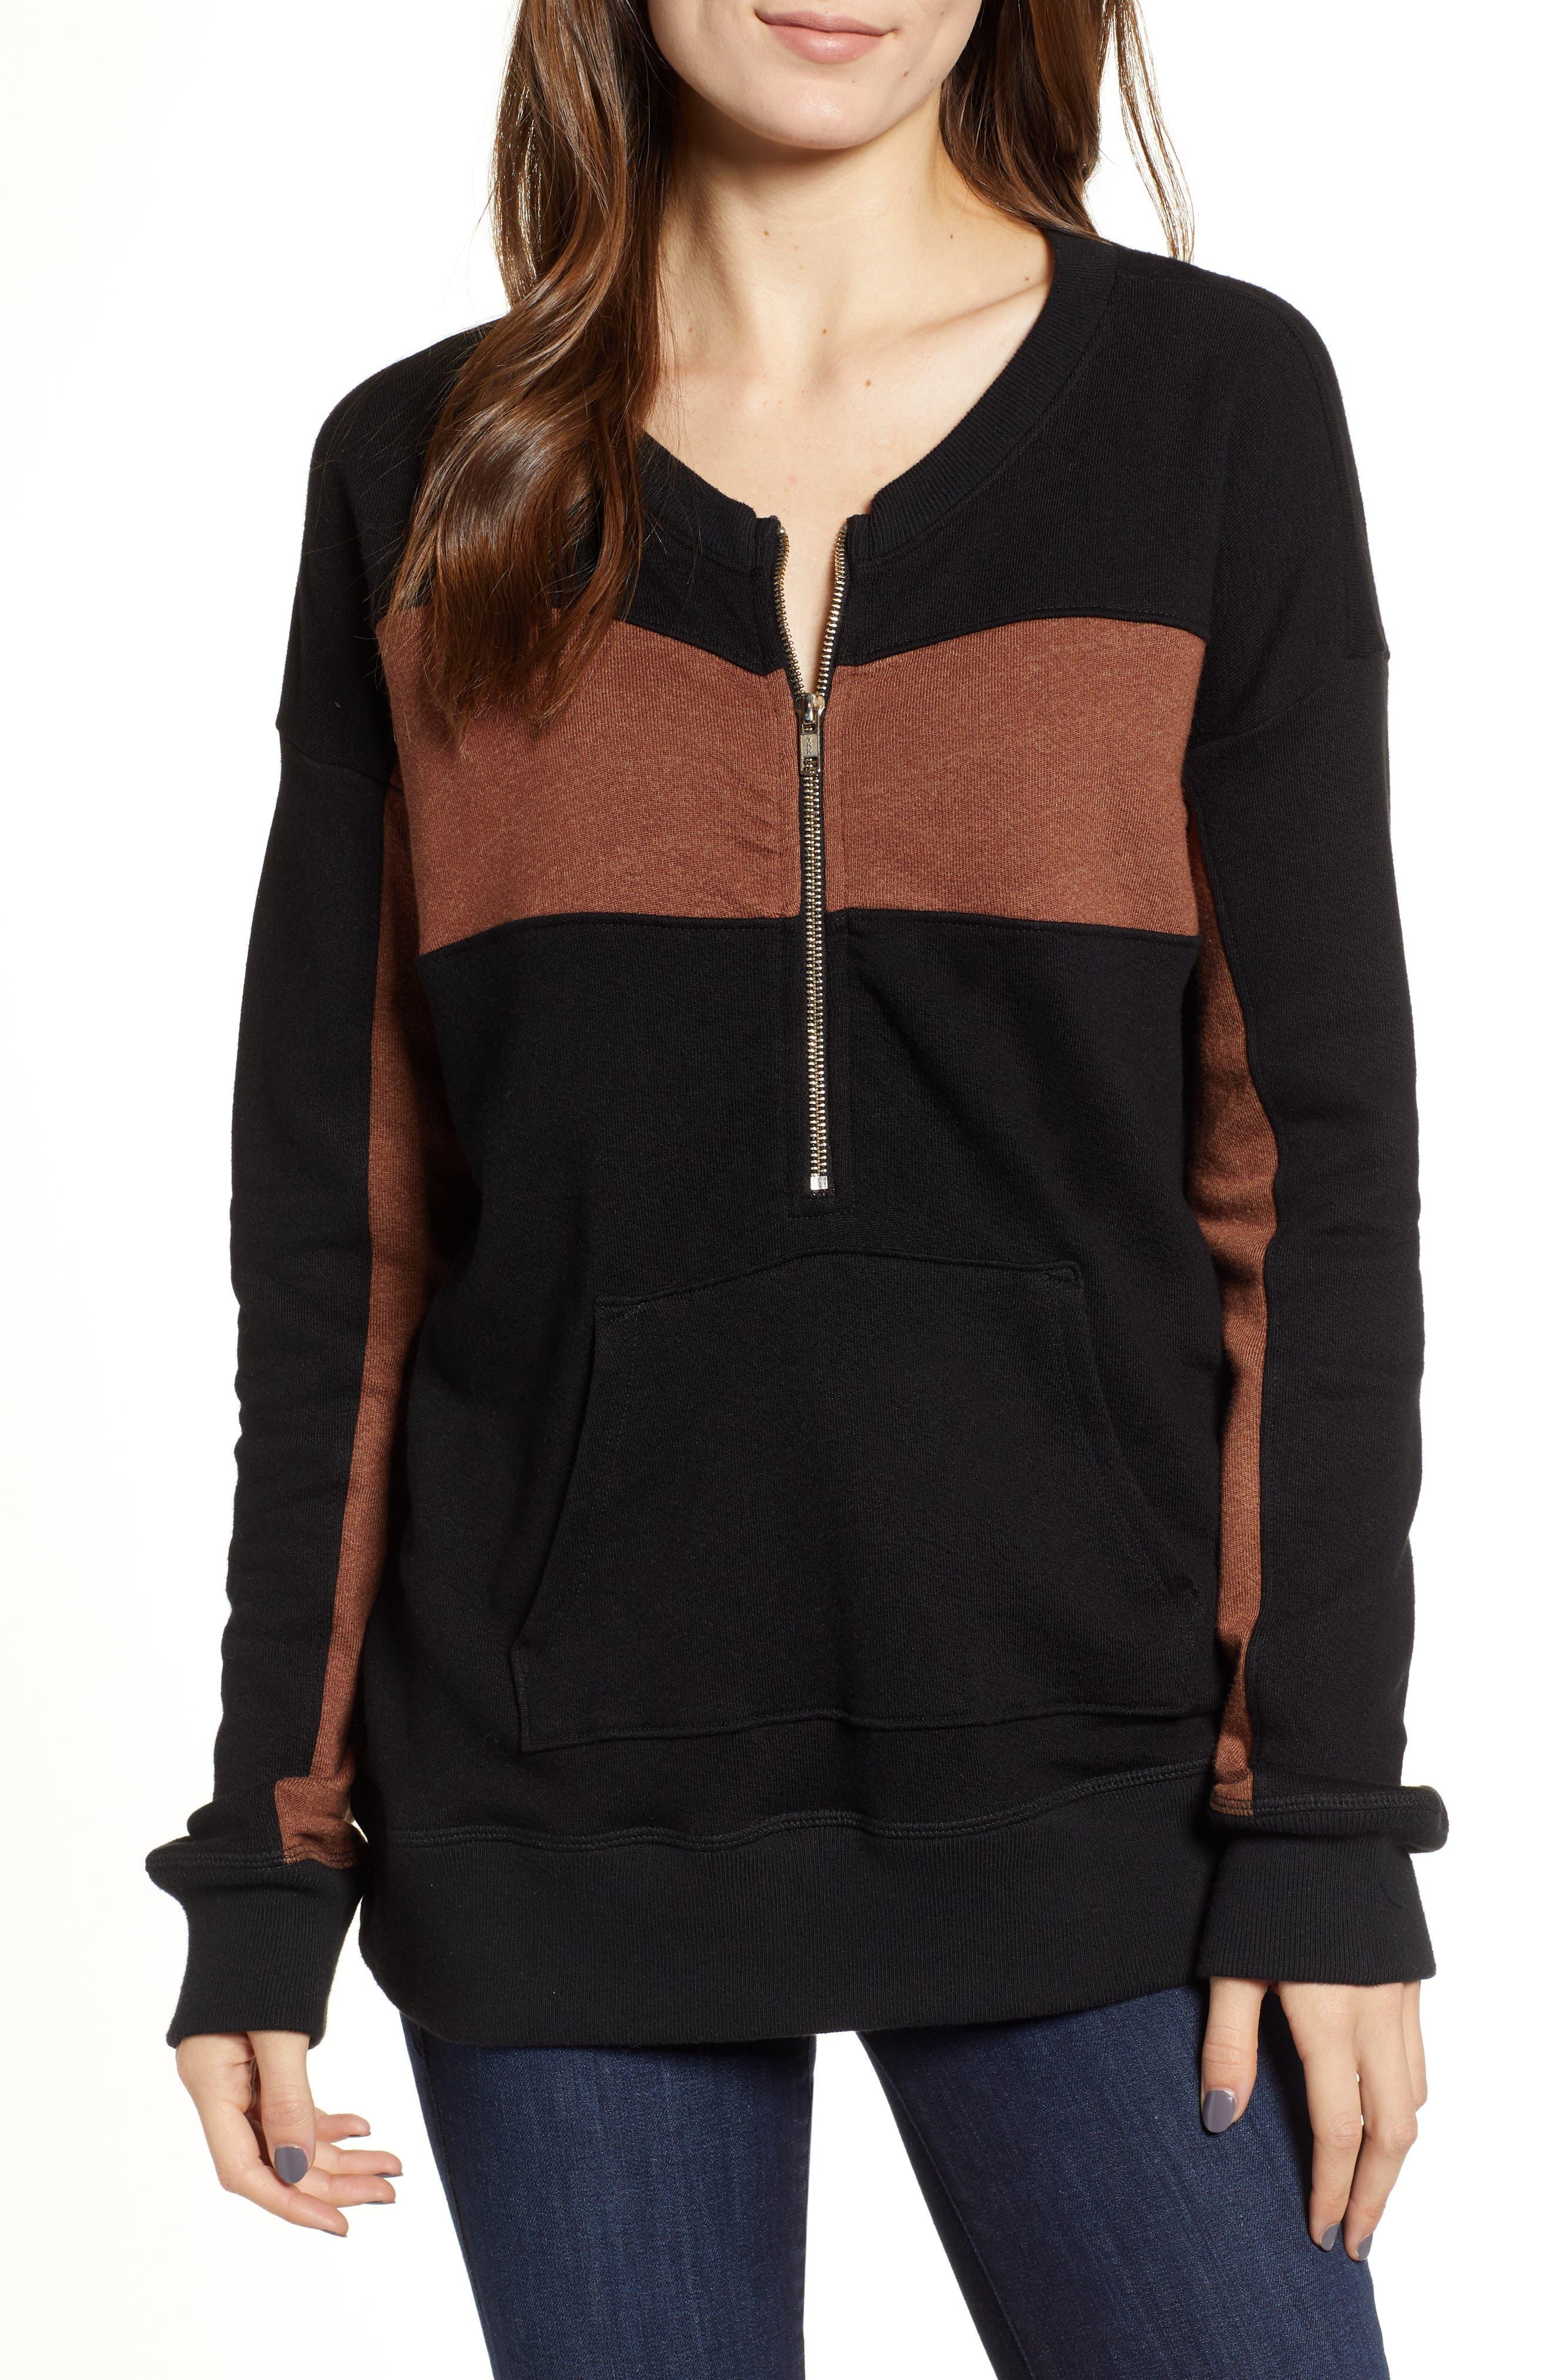 N PHILANTHROPY Stripe Quarter Zip Sweatshirt in Black Cat Copper